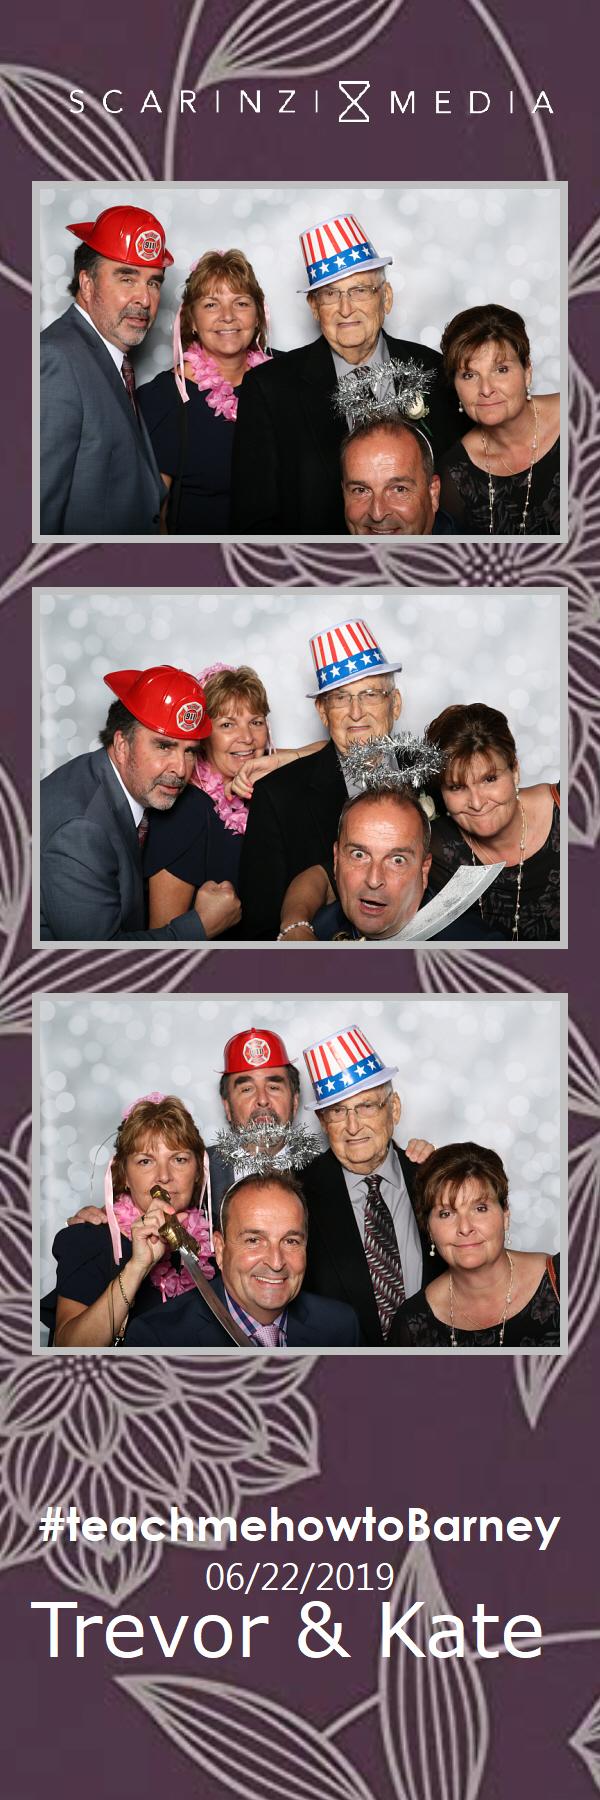 2019.06.22 - Barney Wedding PHOTOBOOTH19.jpg